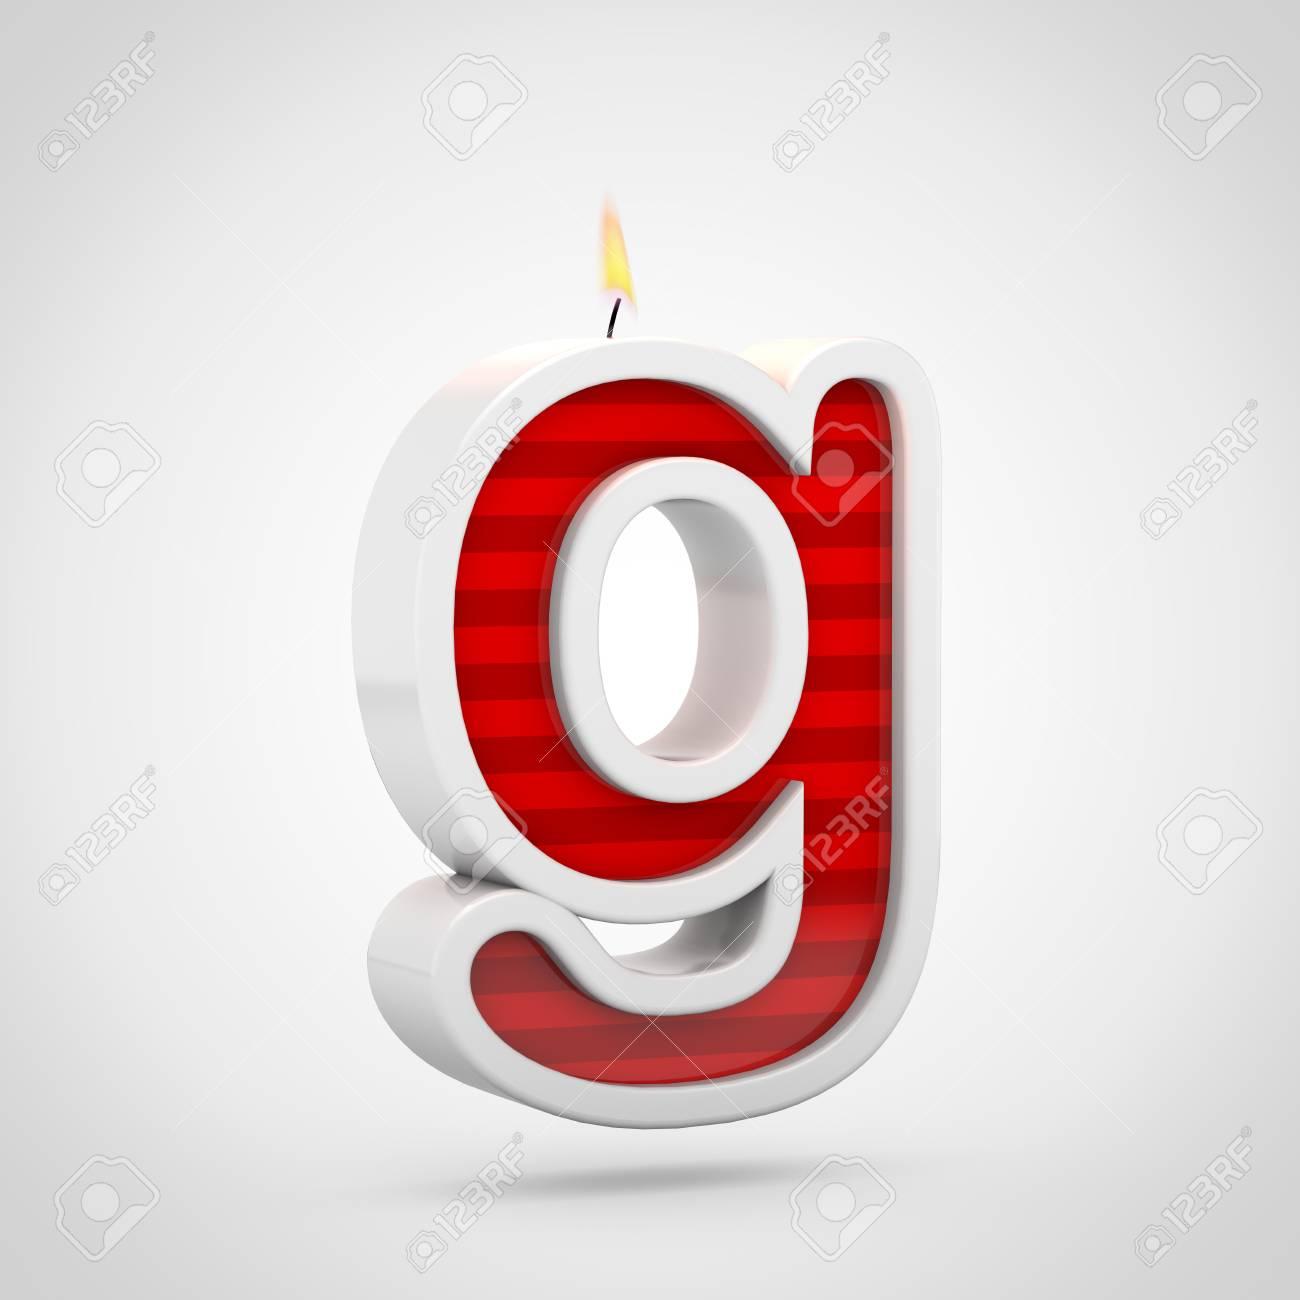 Cumpleaños Vela Letra G Minúscula. 3D Rinden De Fuente Roja De La ...